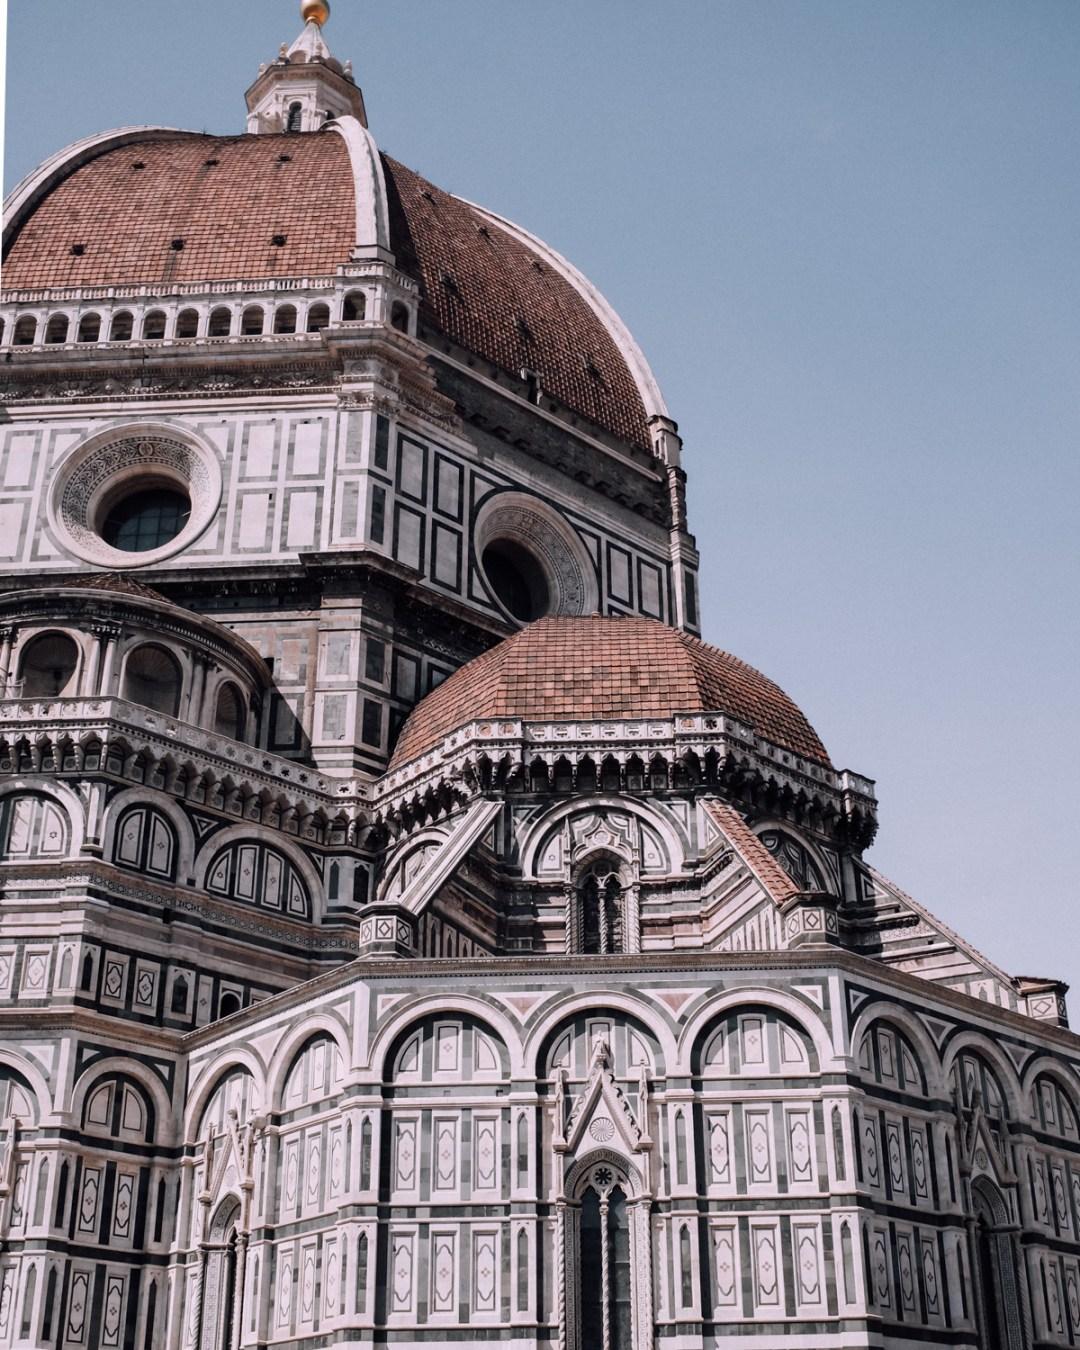 inastil, Ü50Blogger, Reiseblogger, Toskana, Villa, Florenz, Siena, Certaldo, Lifestyle, Italienreise, Italienliebe, Cabriotour